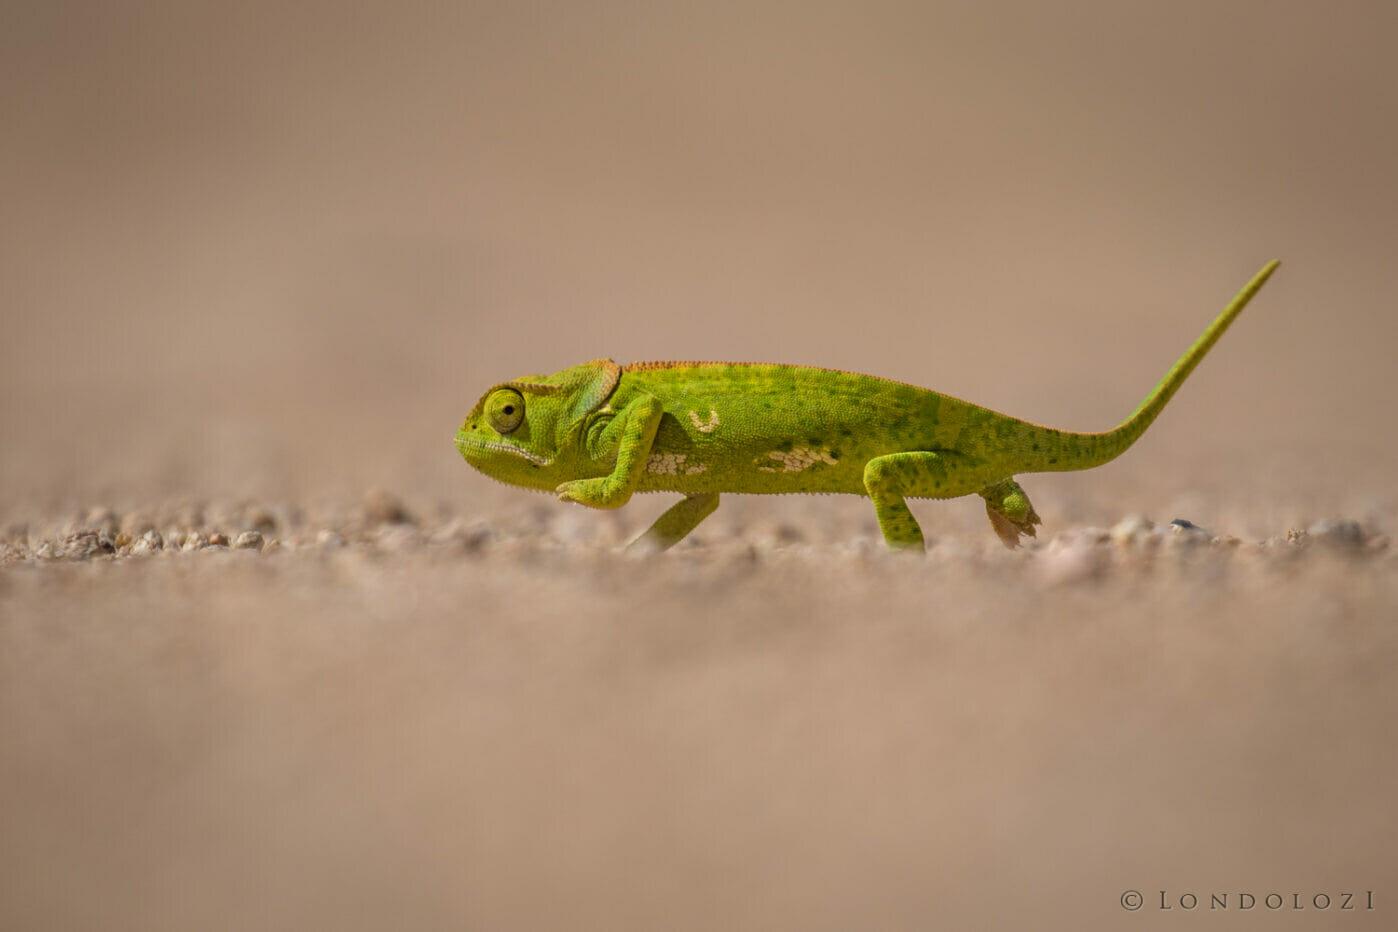 Jts Chameleon Low Angle